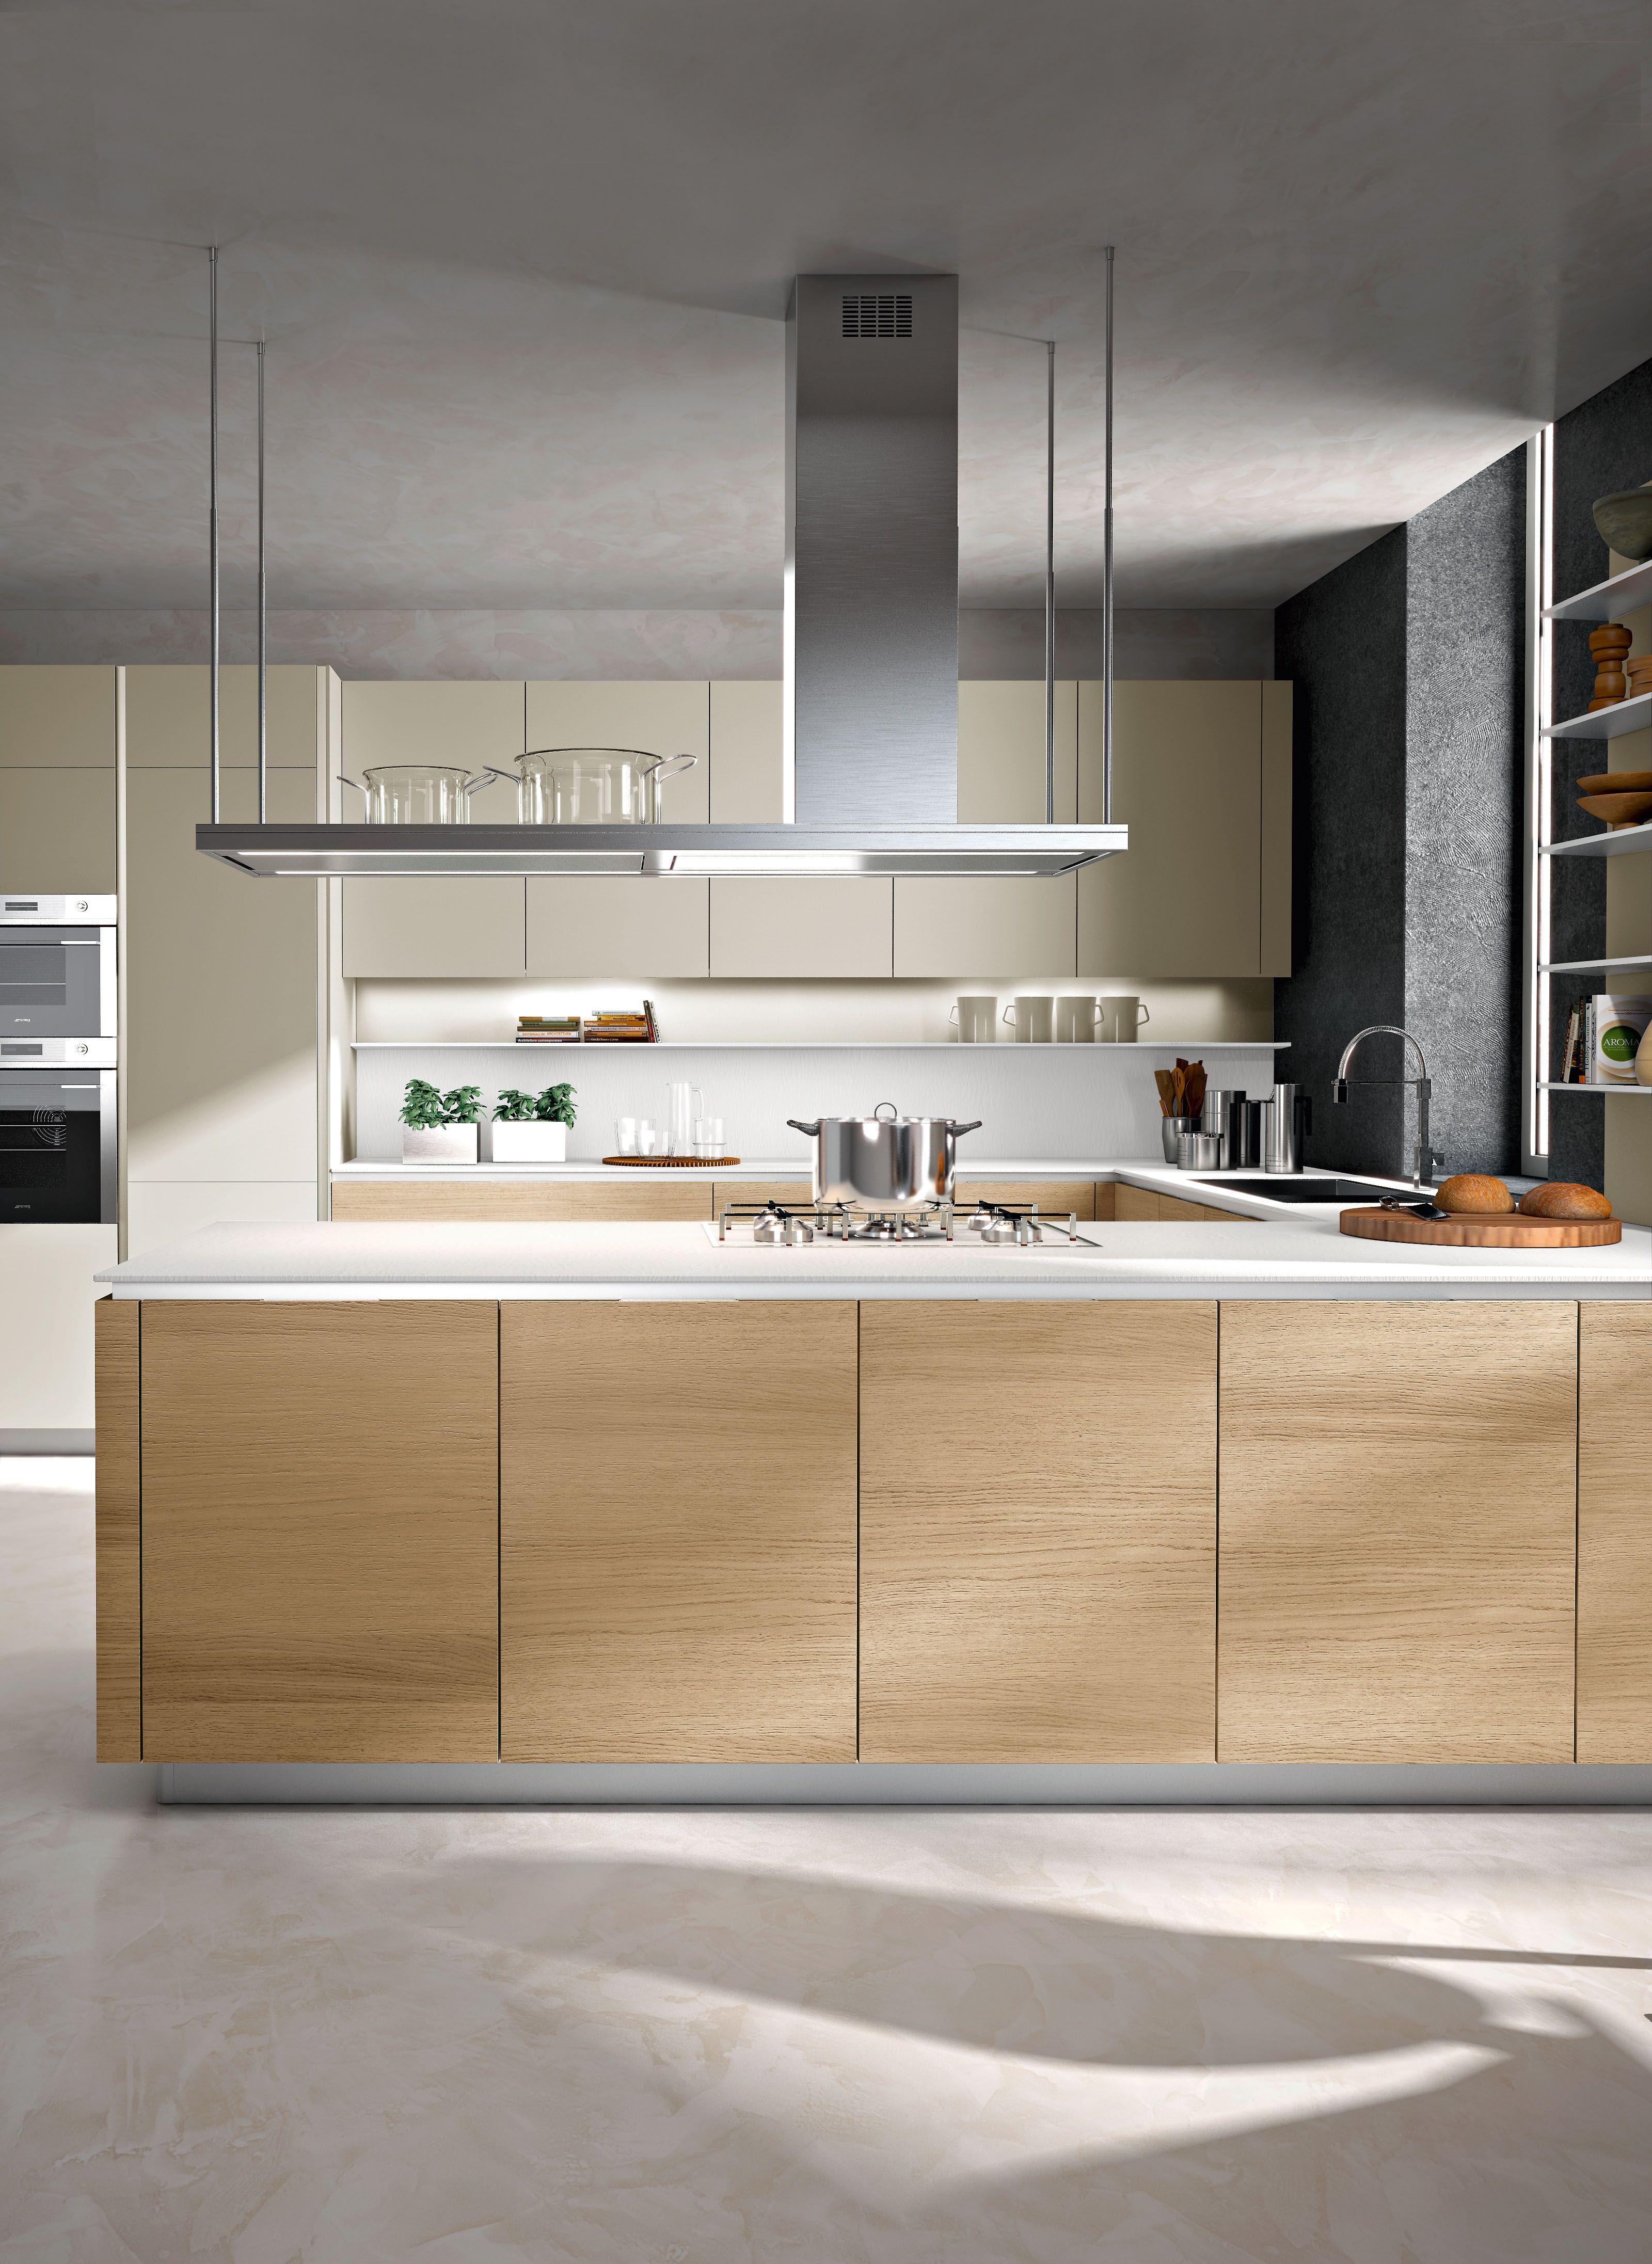 balanced and meditative calm, snaidero orange kitchen design